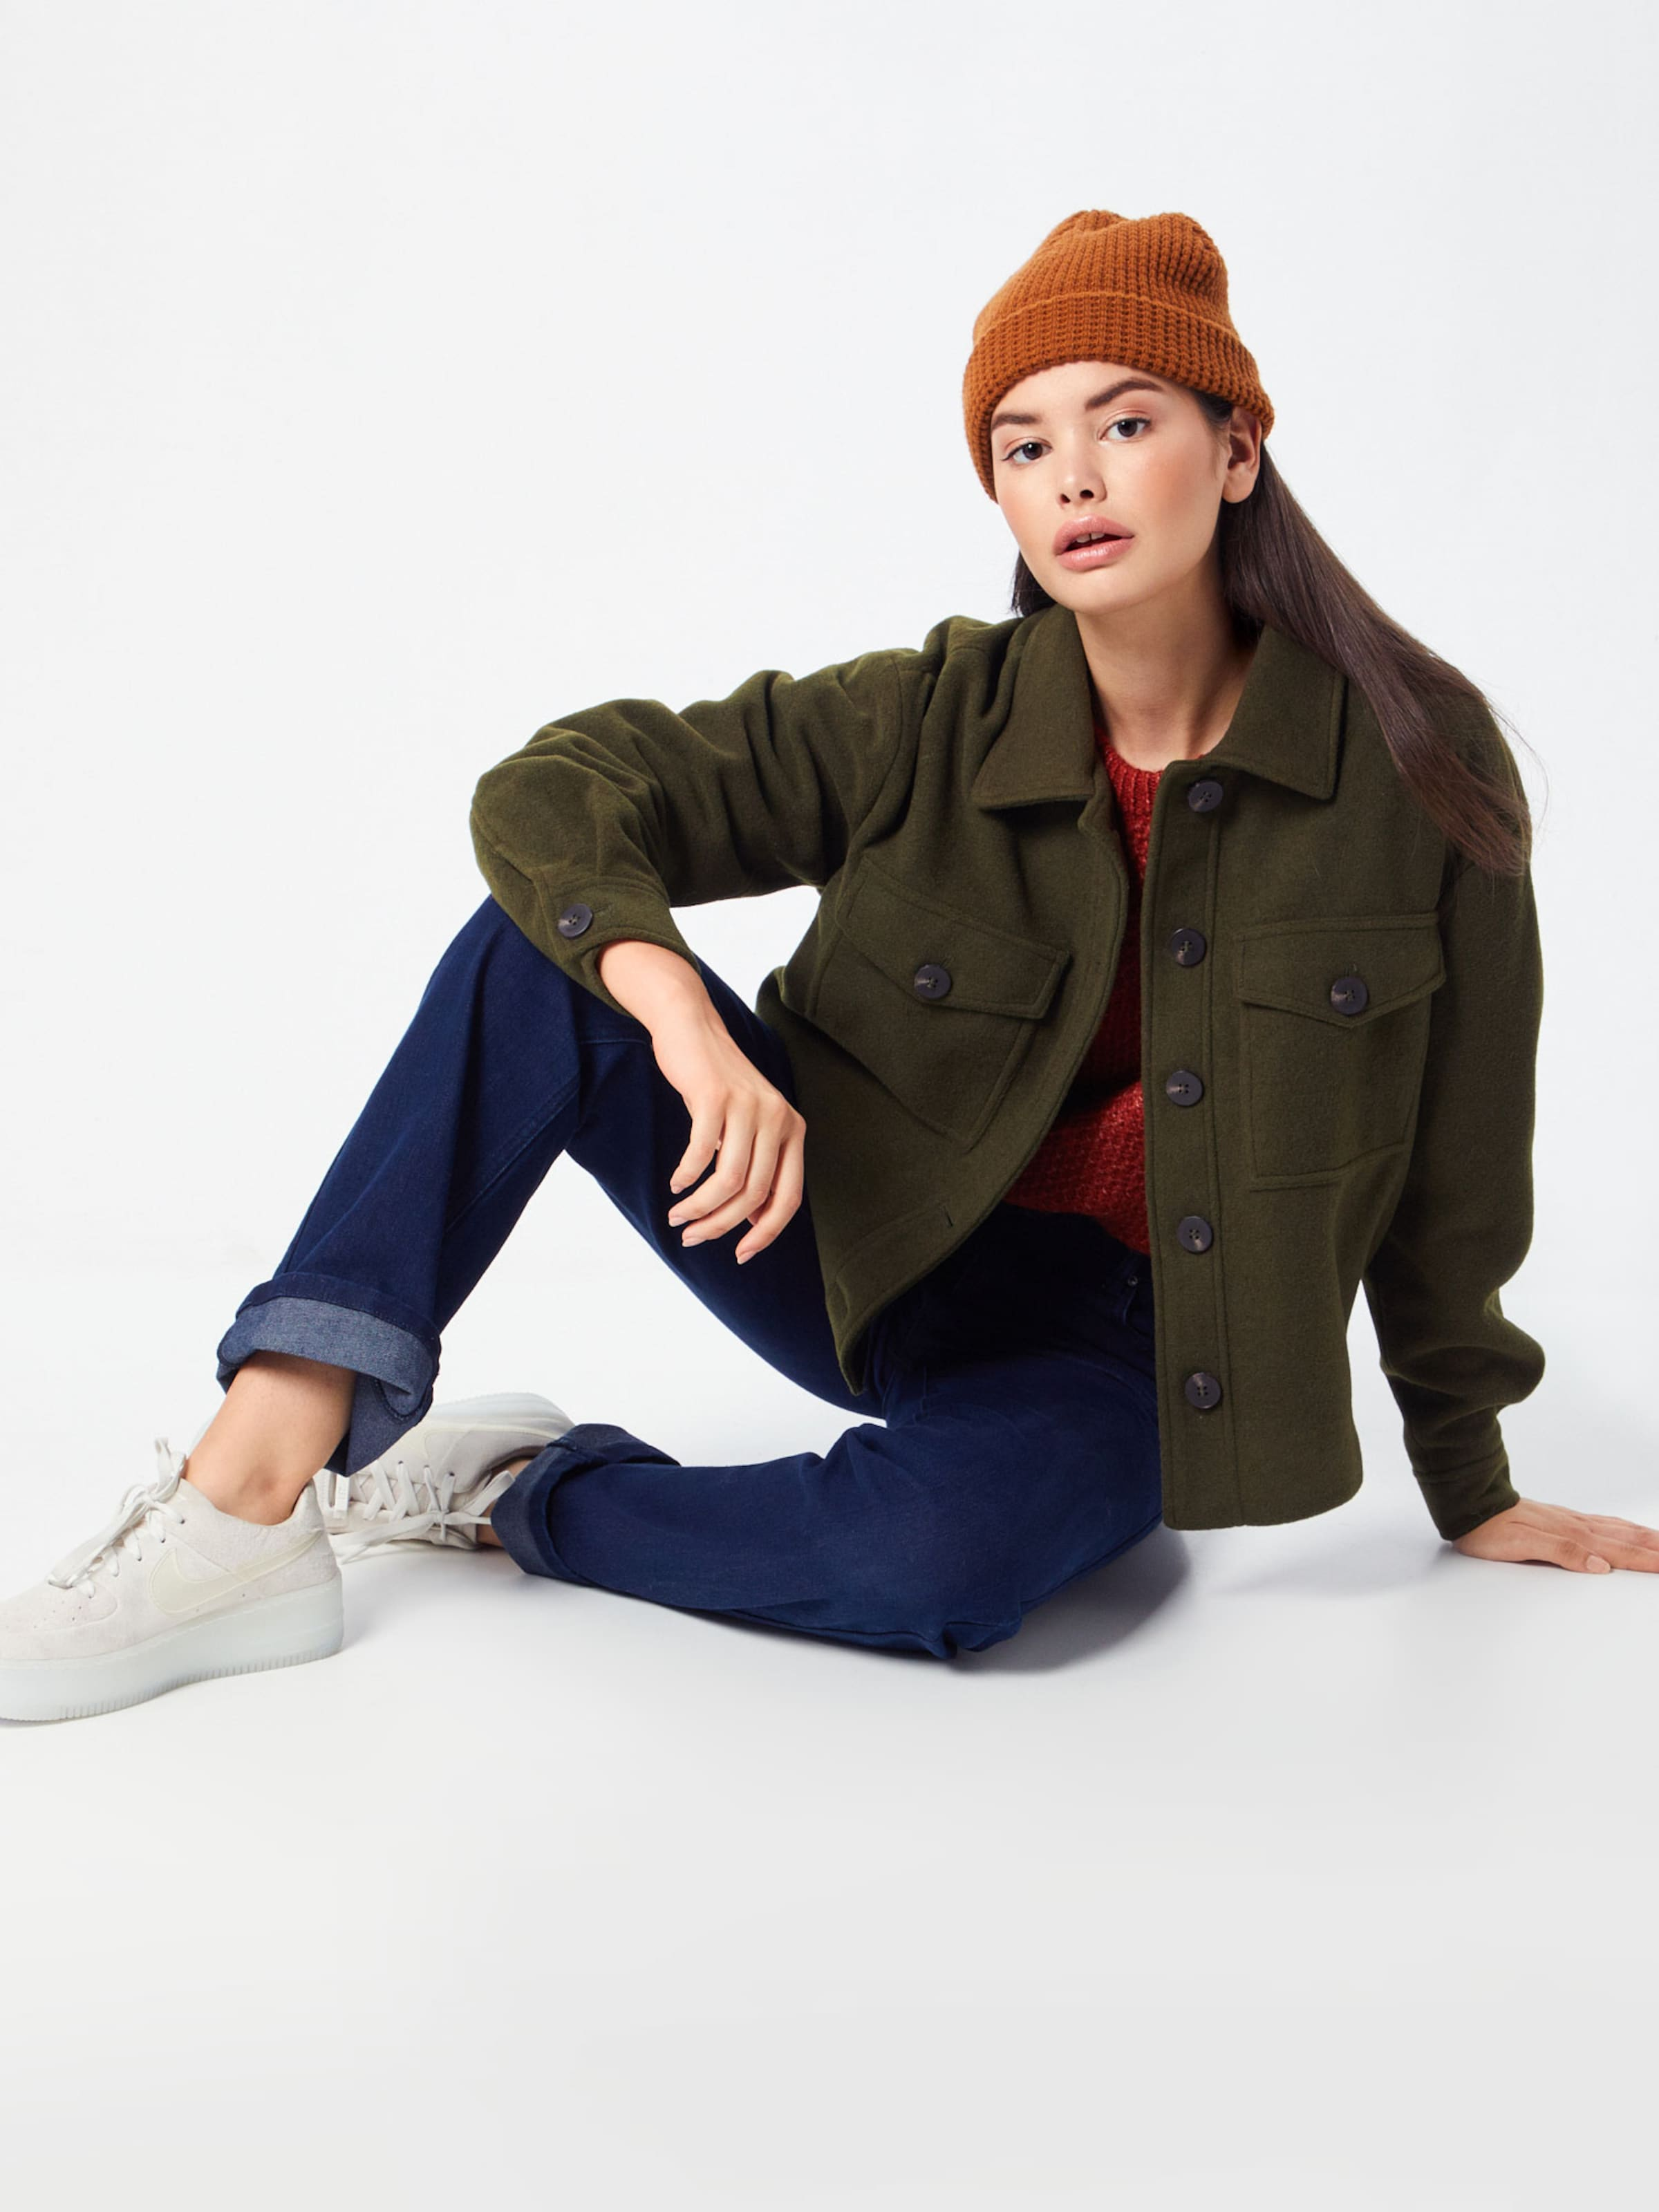 Vila En Olive Wool saison Mi 'virumble Short Veste Jacket' oQrxCBedW